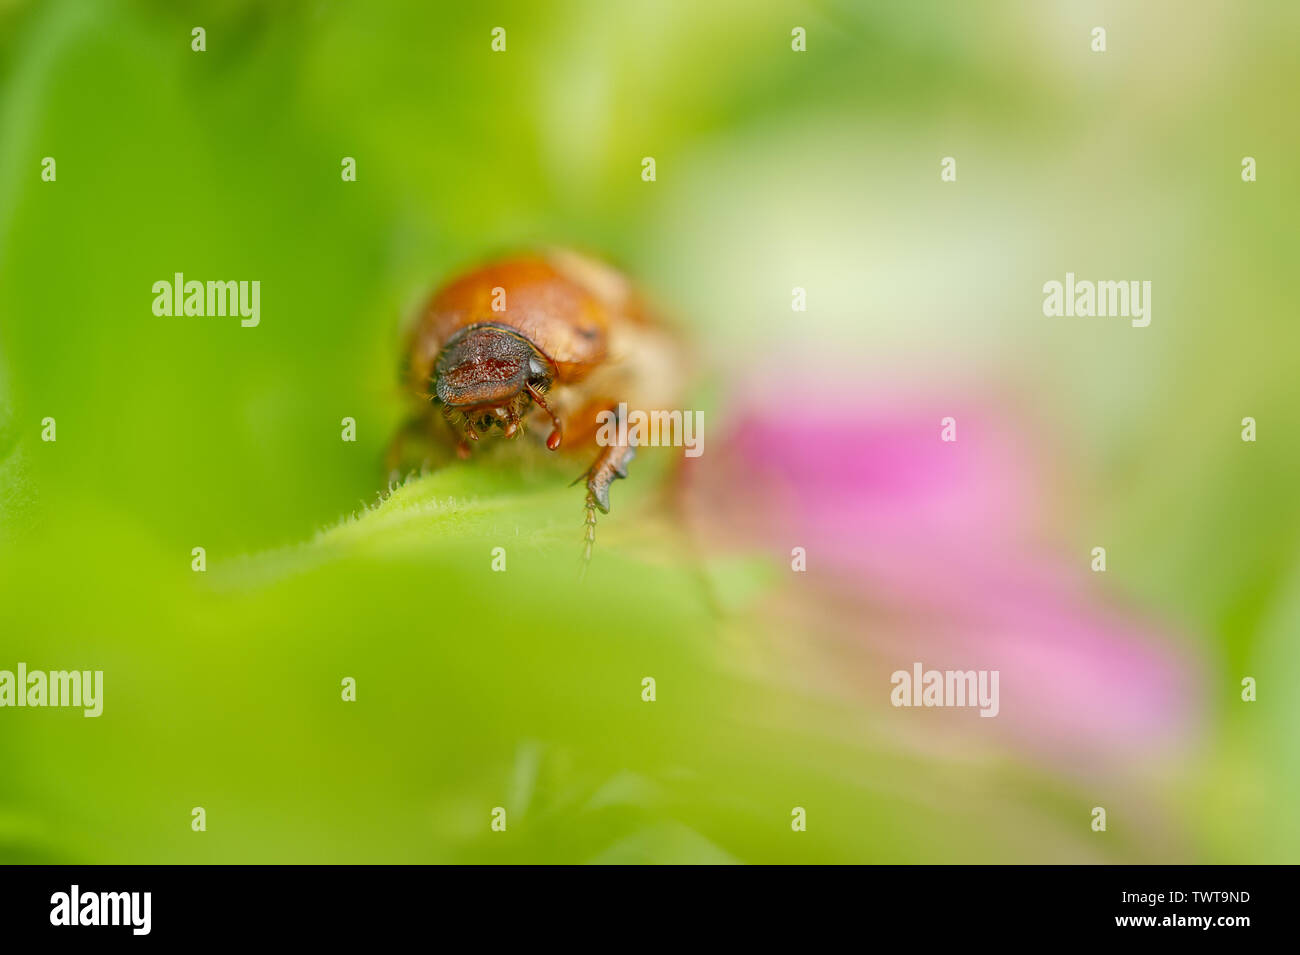 European june beetle on flower. Summer chafer in green leaves. Amphimallon solstitiale. - Stock Image